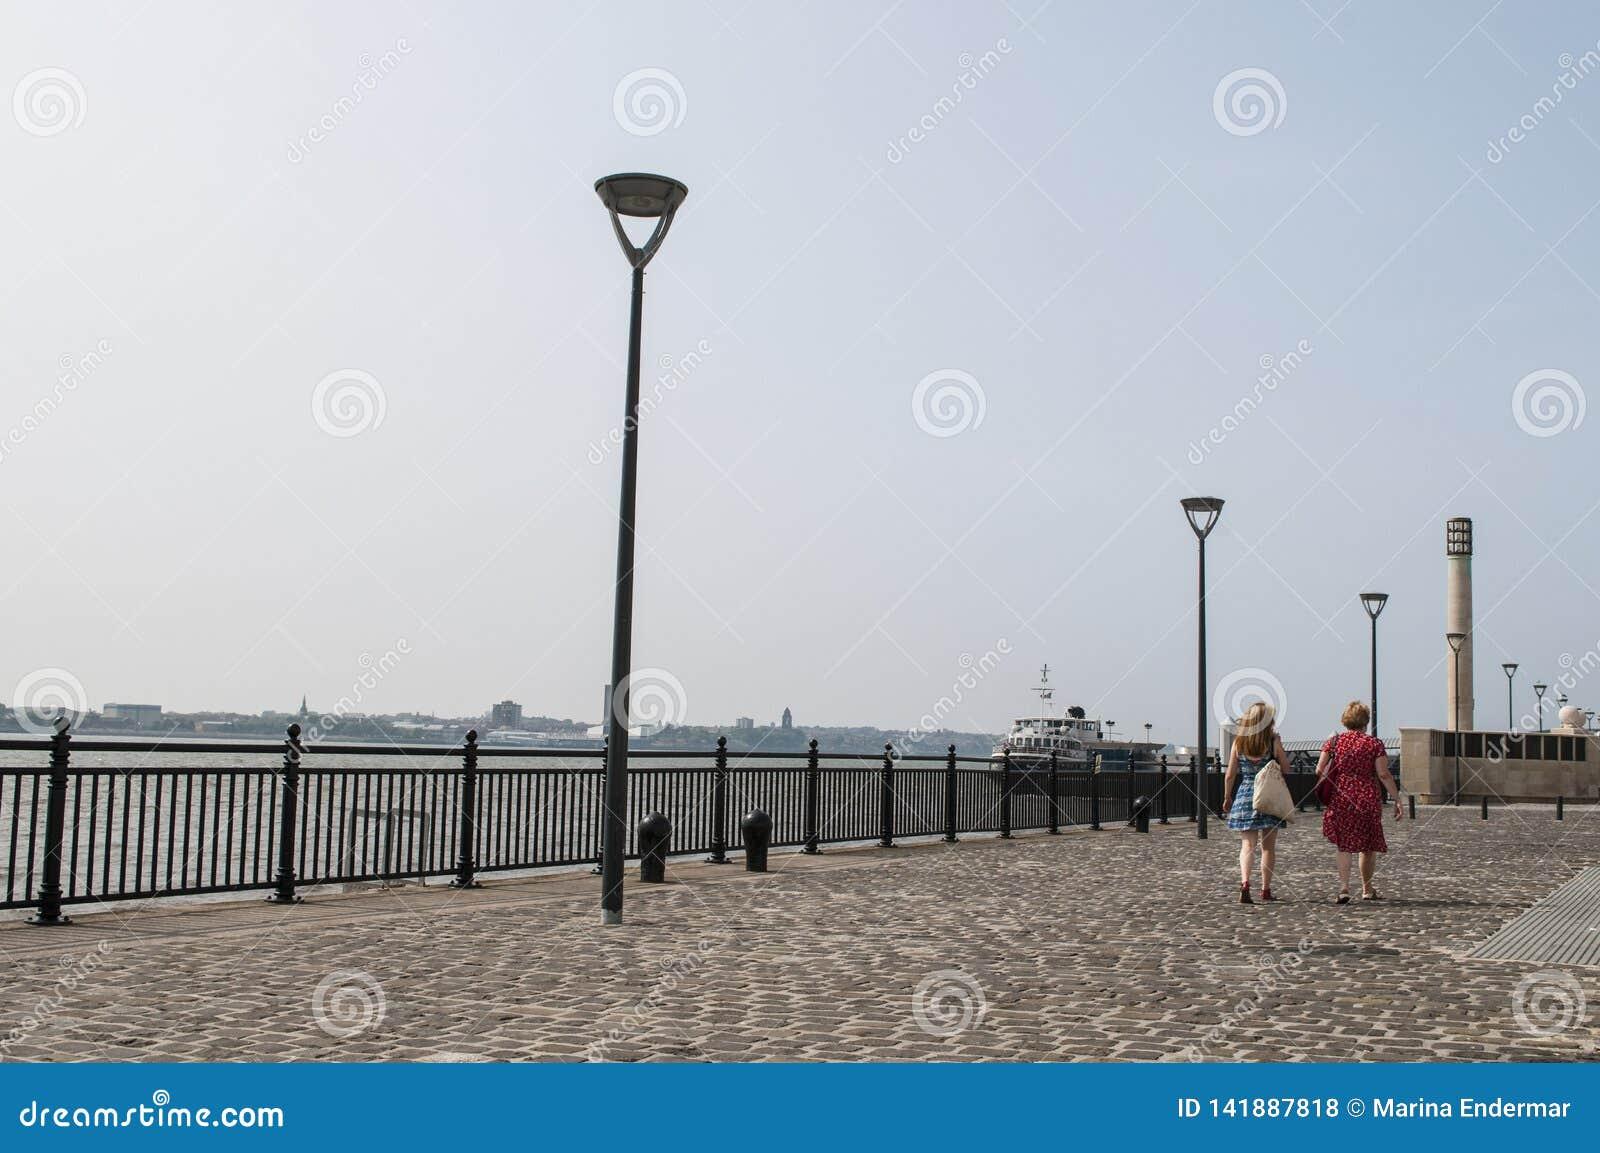 Promenade at Liverpool Waterfront, UK